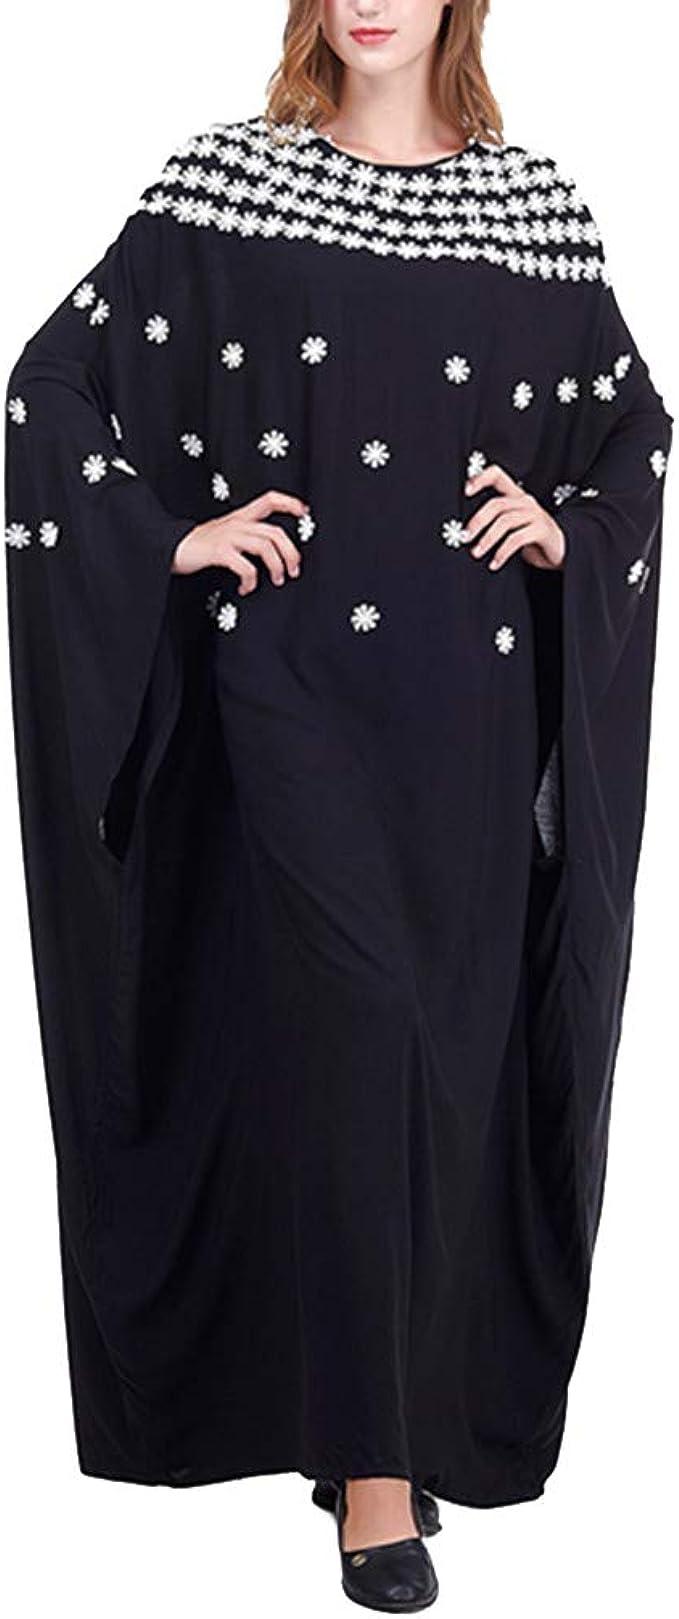 Vestidos Largo Abaya Kaftan Mujer - Ropa Jalabiya Musulmana Islamic Camisa Arabes Bordado Manga de Murciélago Vintage: Amazon.es: Ropa y accesorios